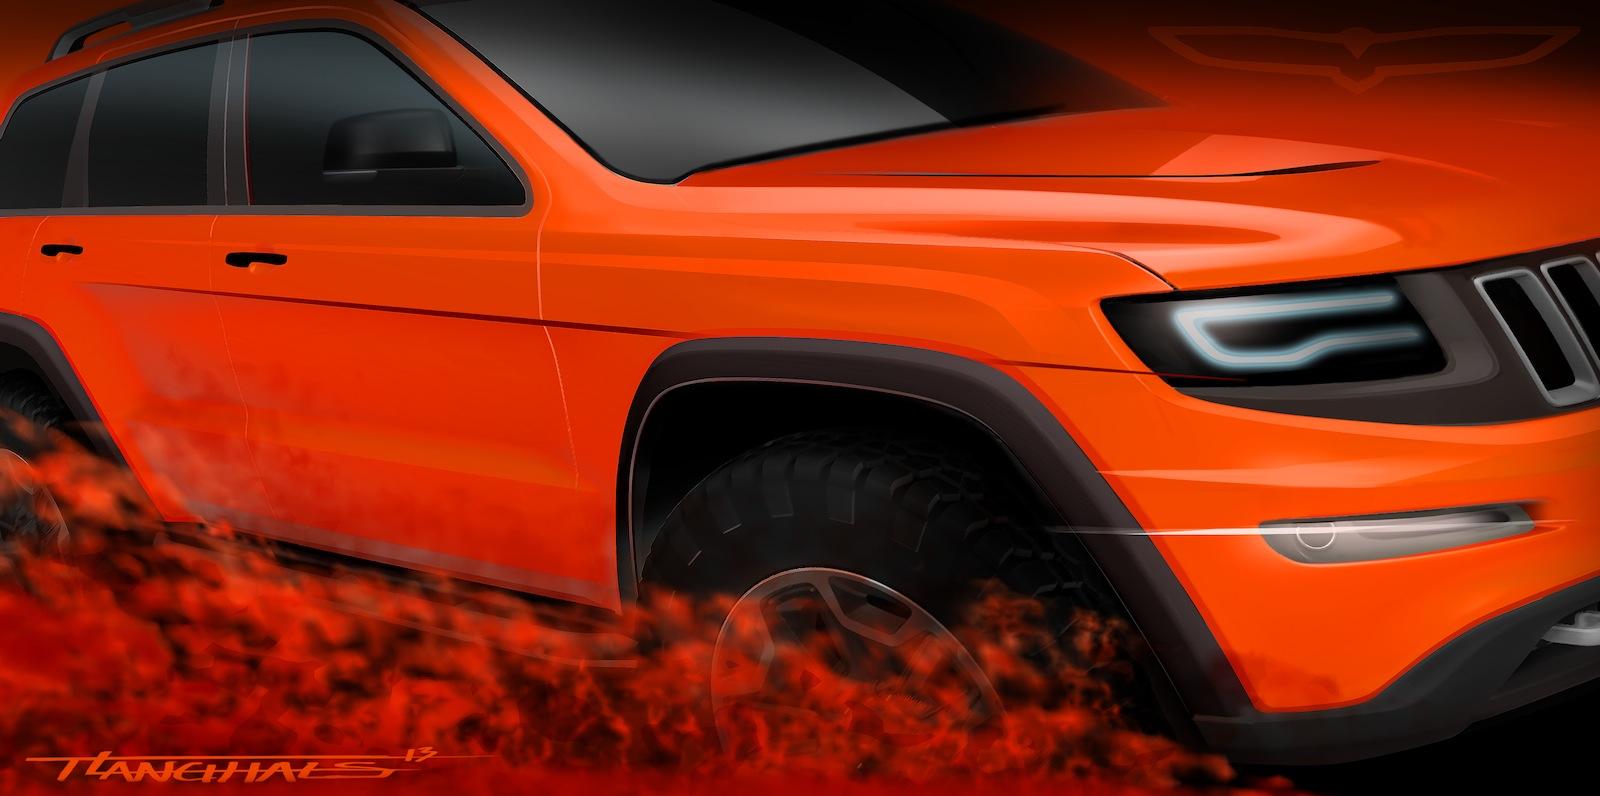 Hot Cars Automotive - Mio decalsmio mz transformers red striping stickers decals joehansb